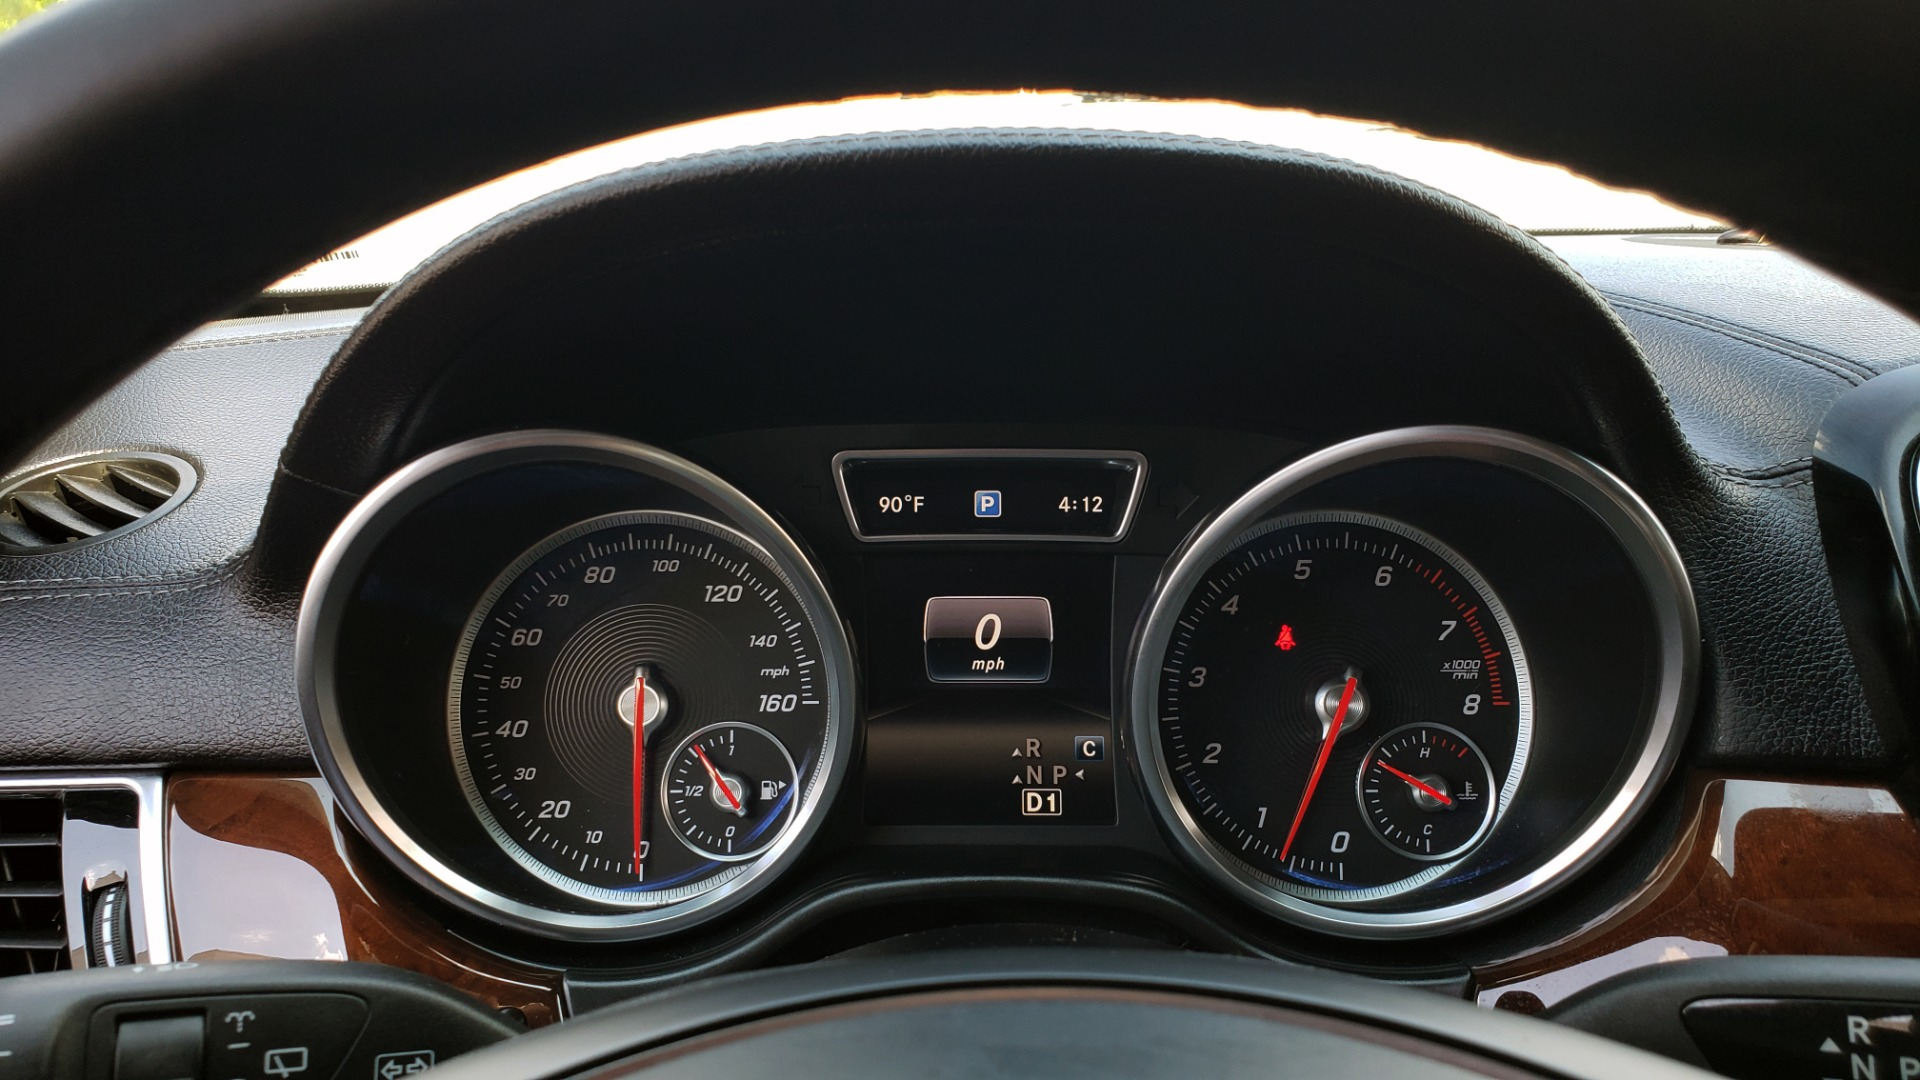 Used 2017 Mercedes-Benz GLS GLS 550 for sale Sold at Formula Imports in Charlotte NC 28227 50